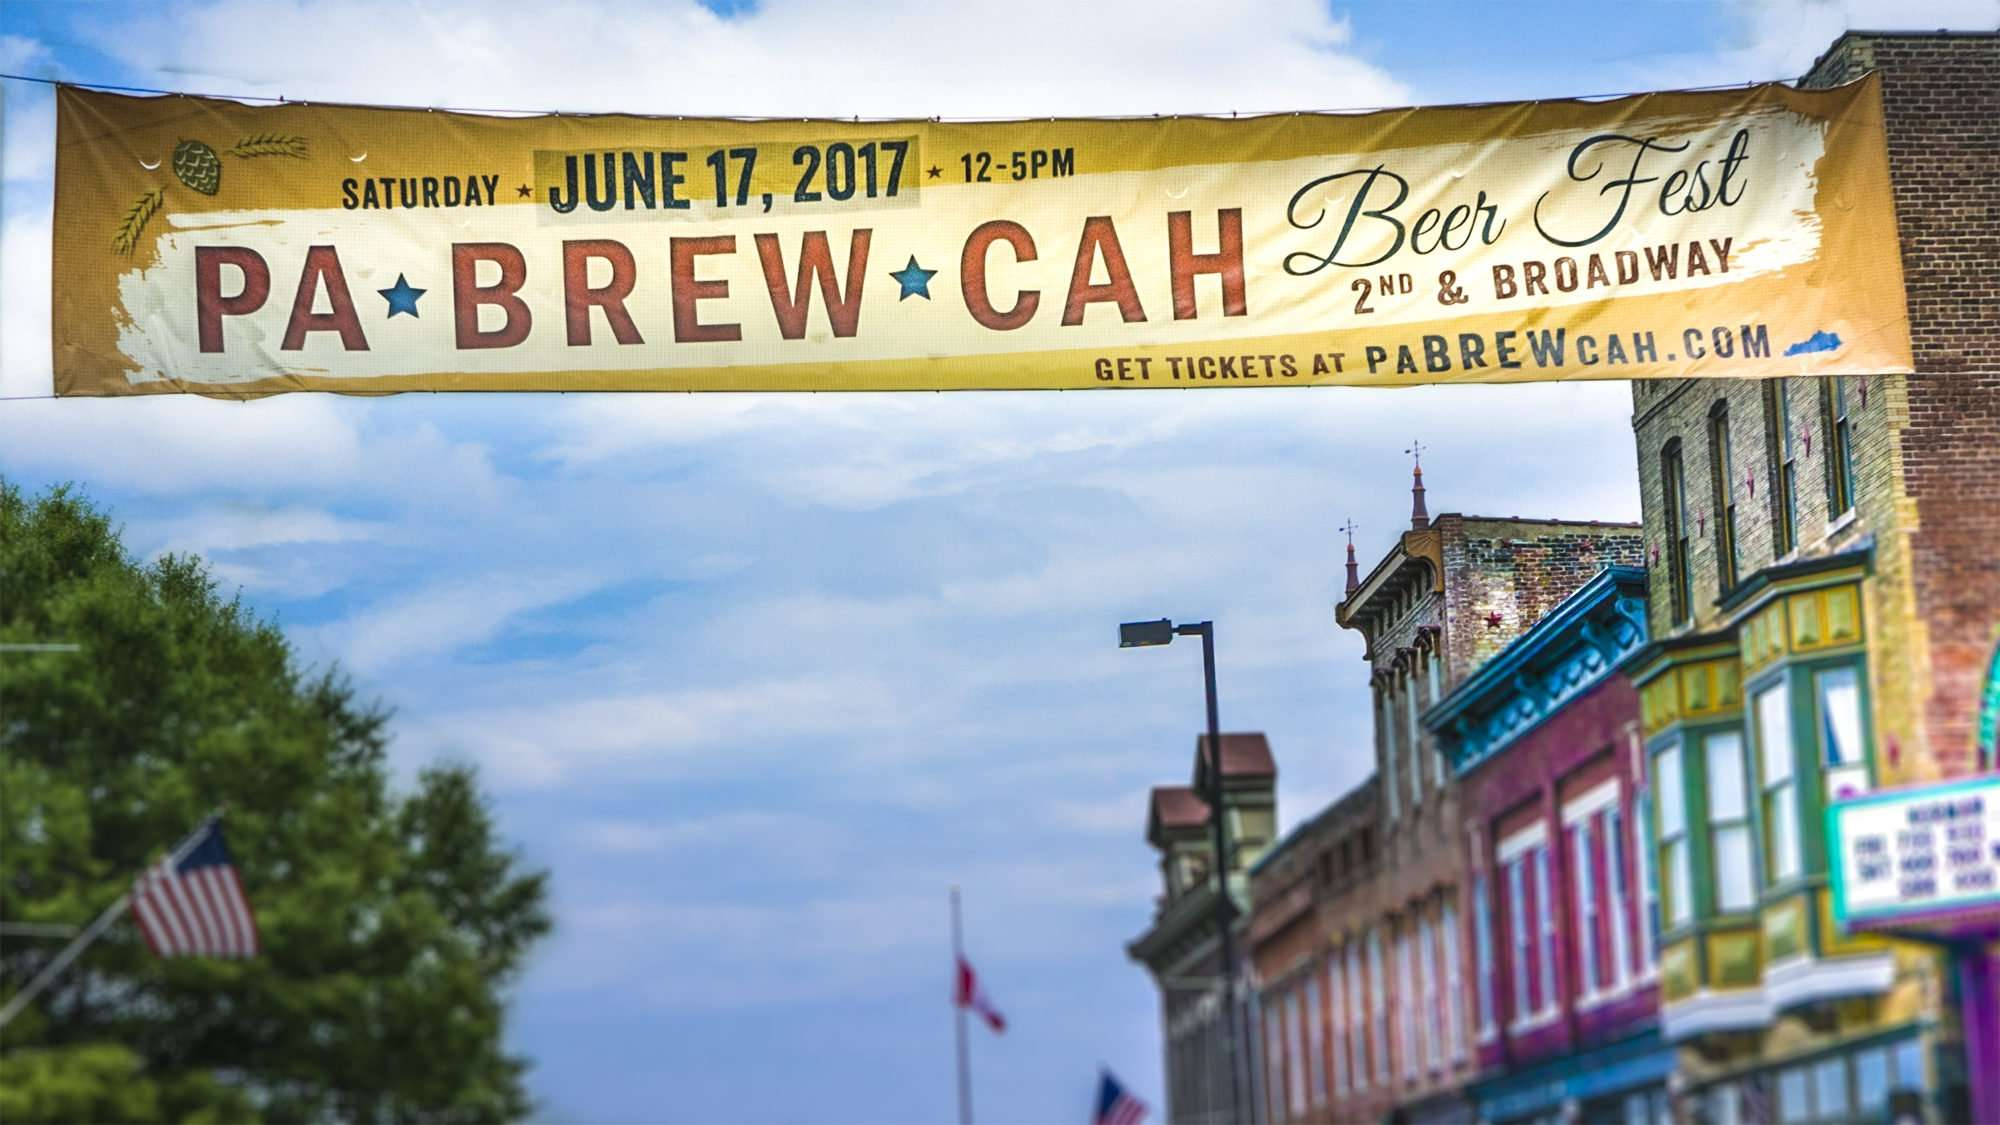 June 17, 2017 - Banner PA-BREW-CAH, Downtown Paducah, KY June 17, 2017/photonews247.com